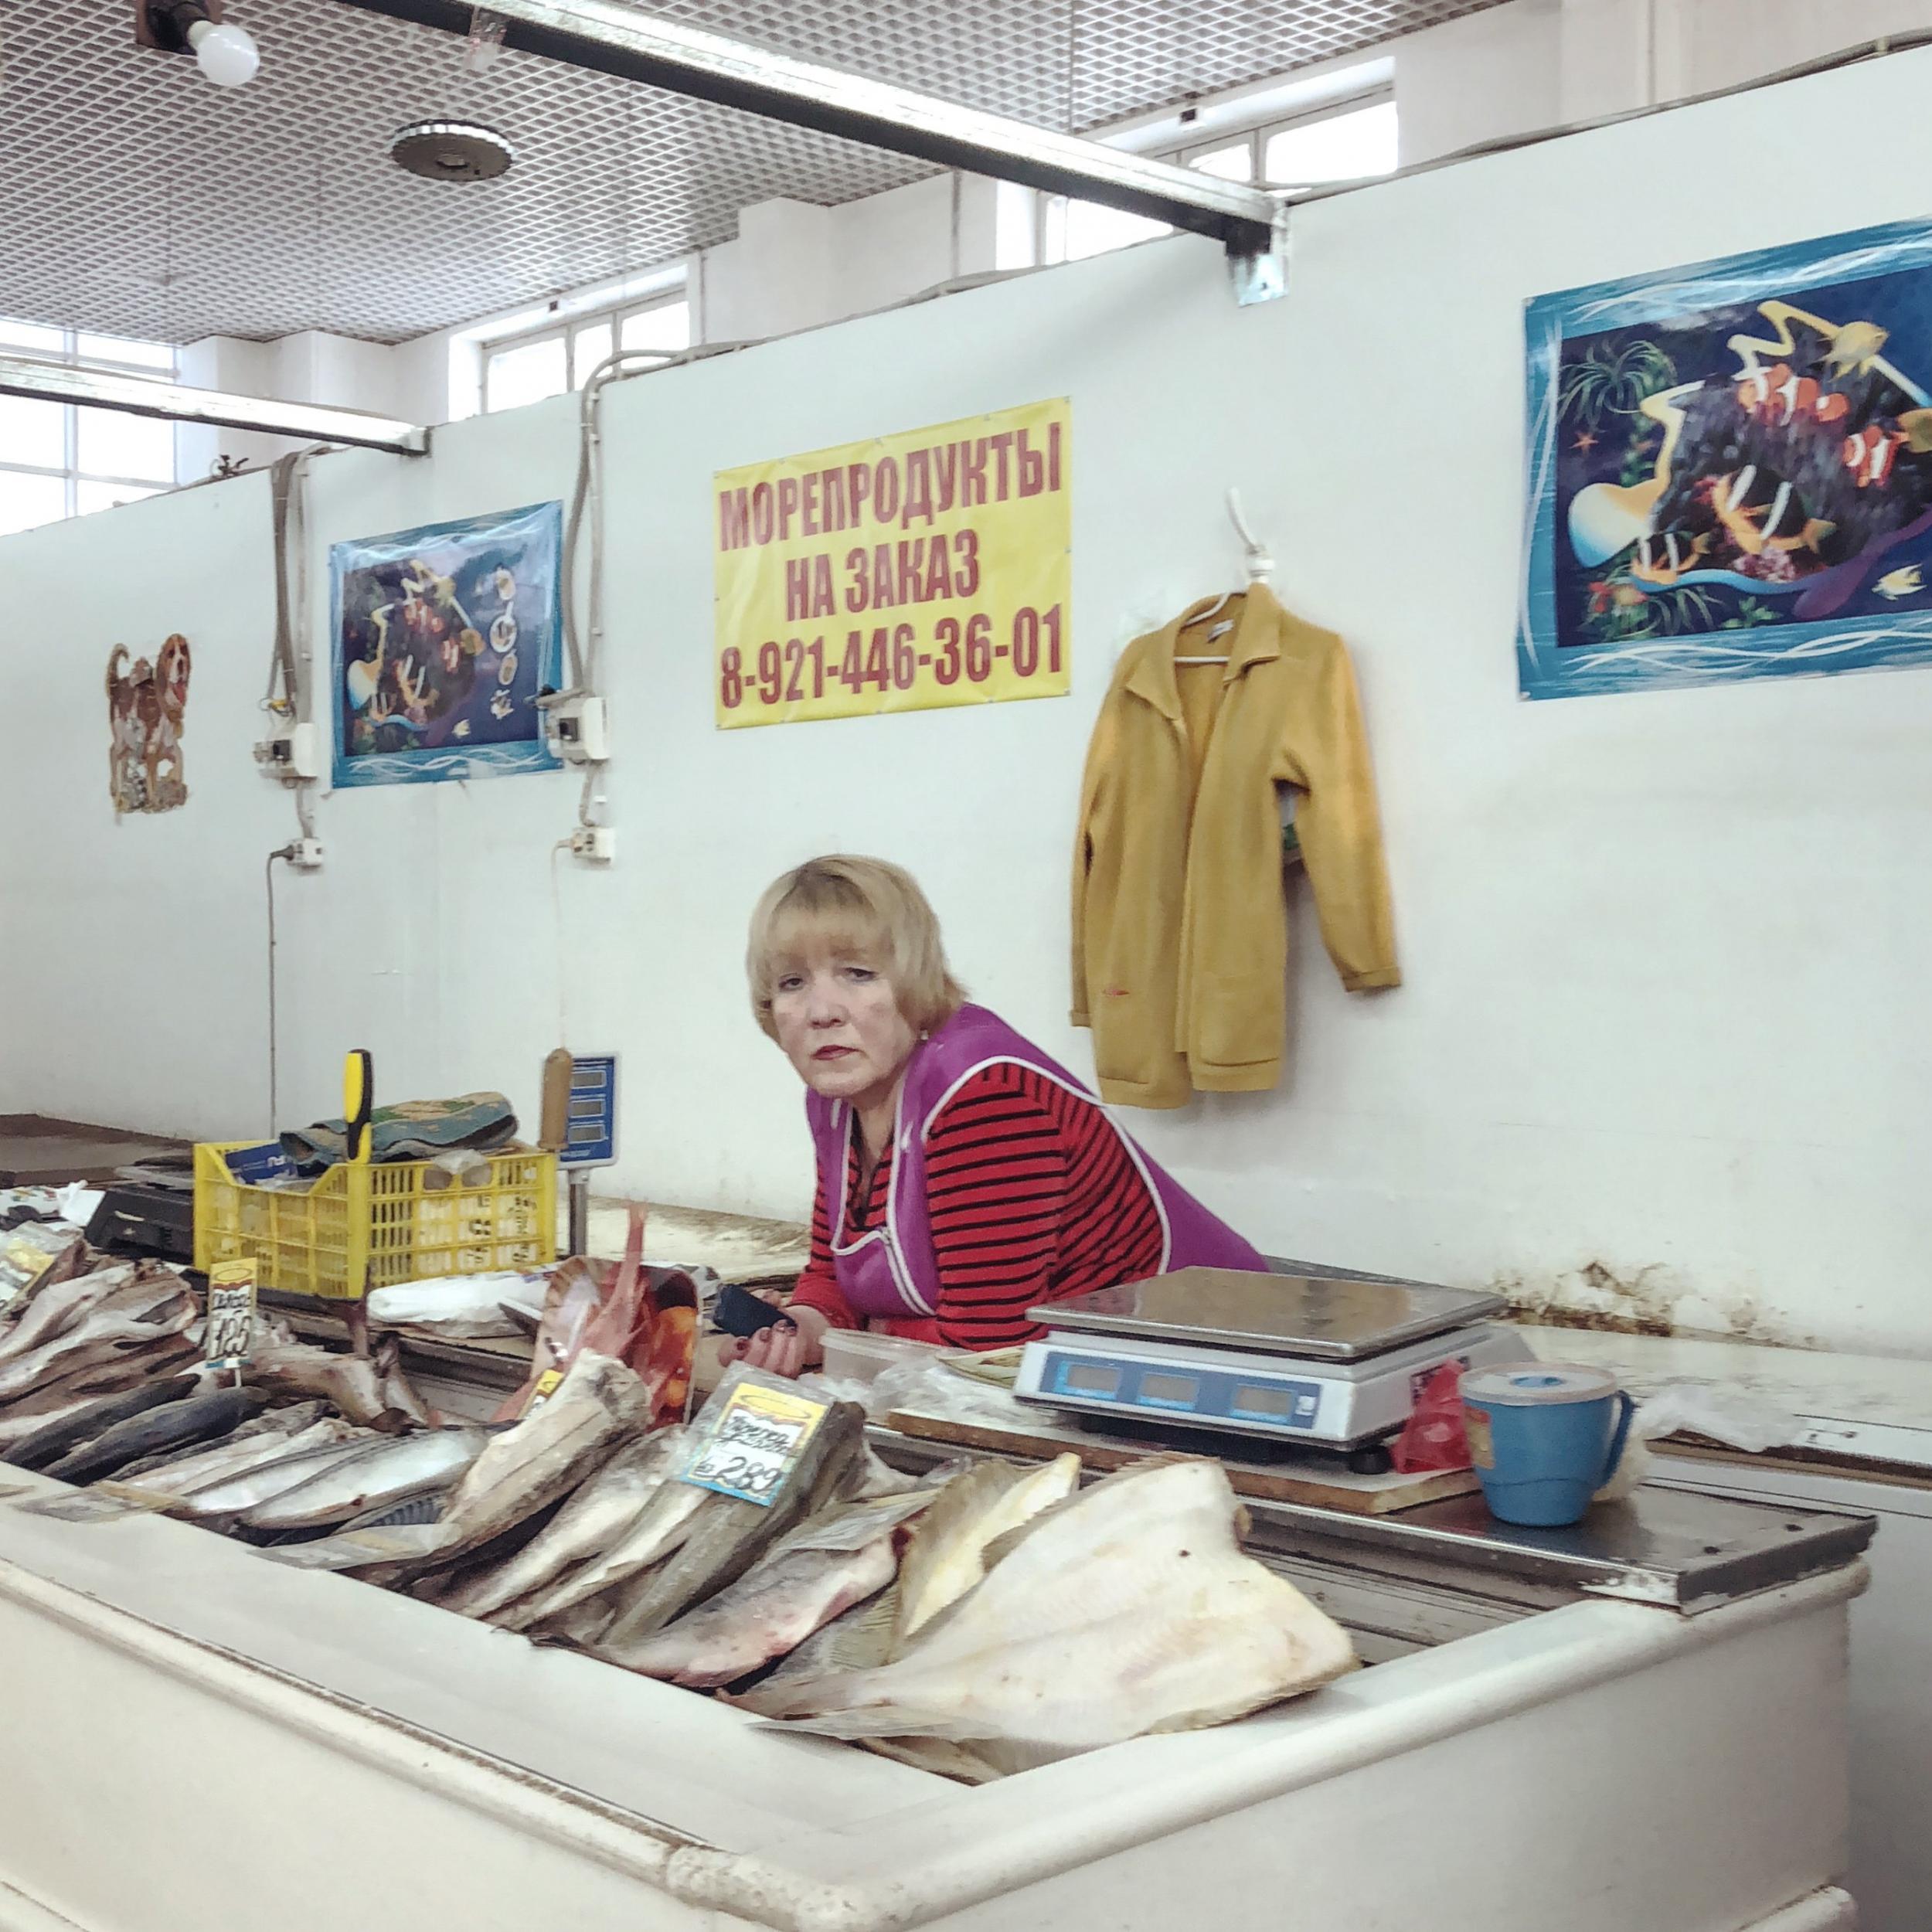 Omsk - for recalling MP Mizulina